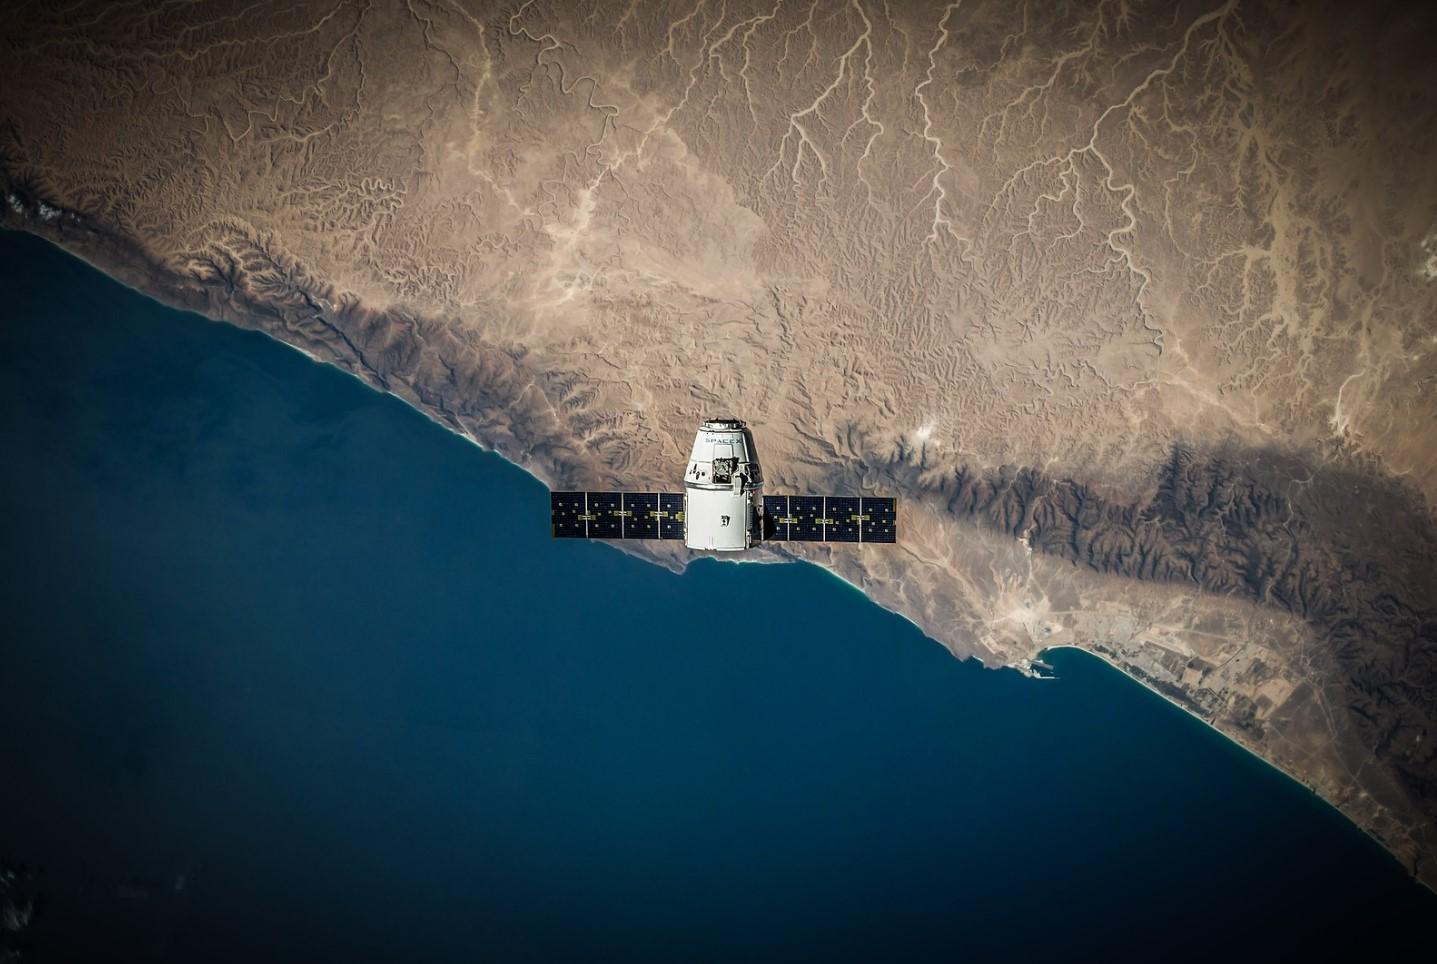 satélite volando